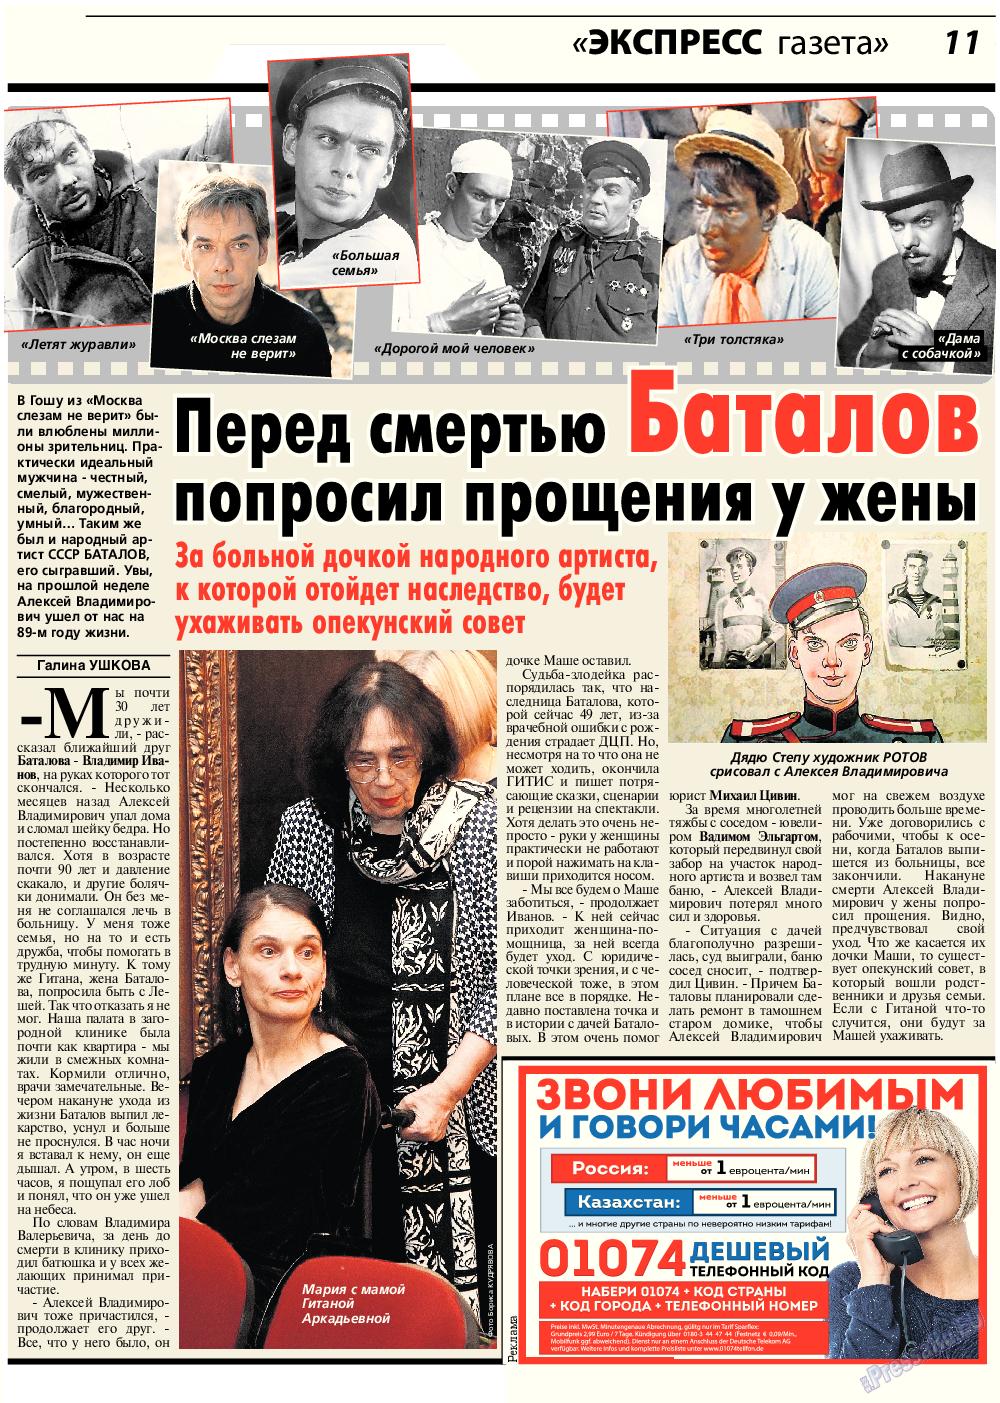 Экспресс газета (газета). 2017 год, номер 8, стр. 11